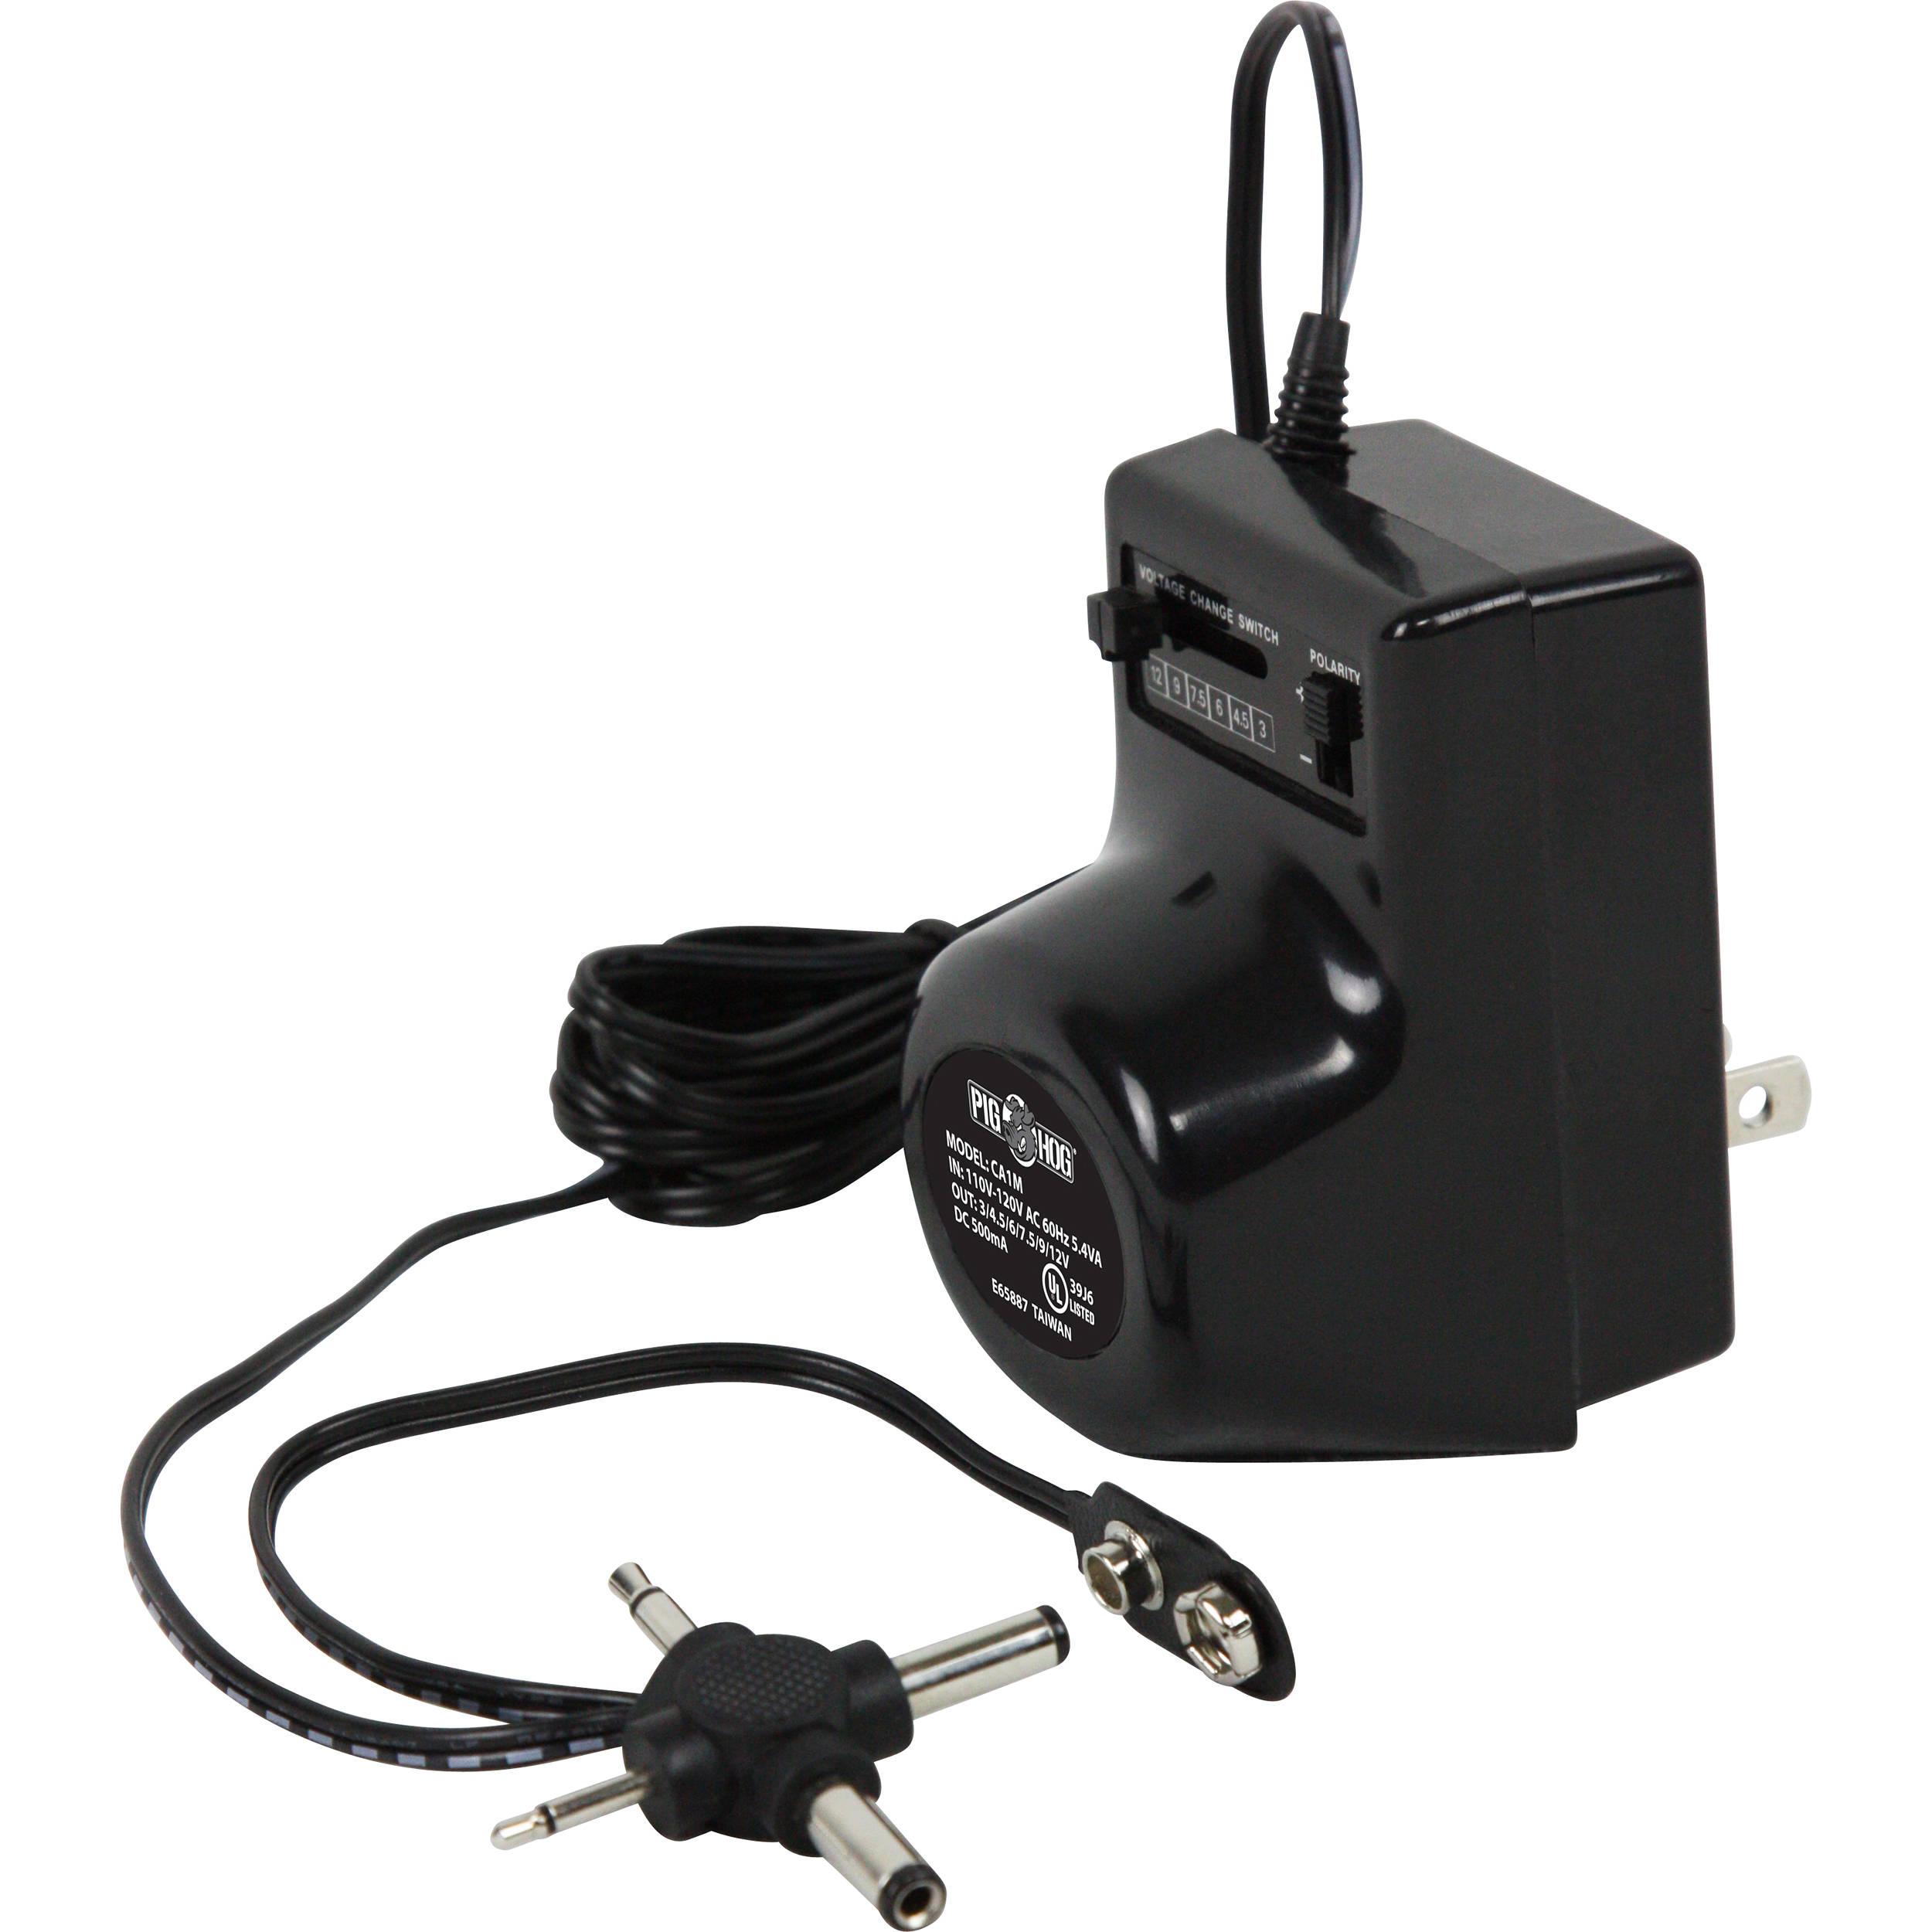 Pig Hog Pig Power 500 mA DC Multi-Adapter